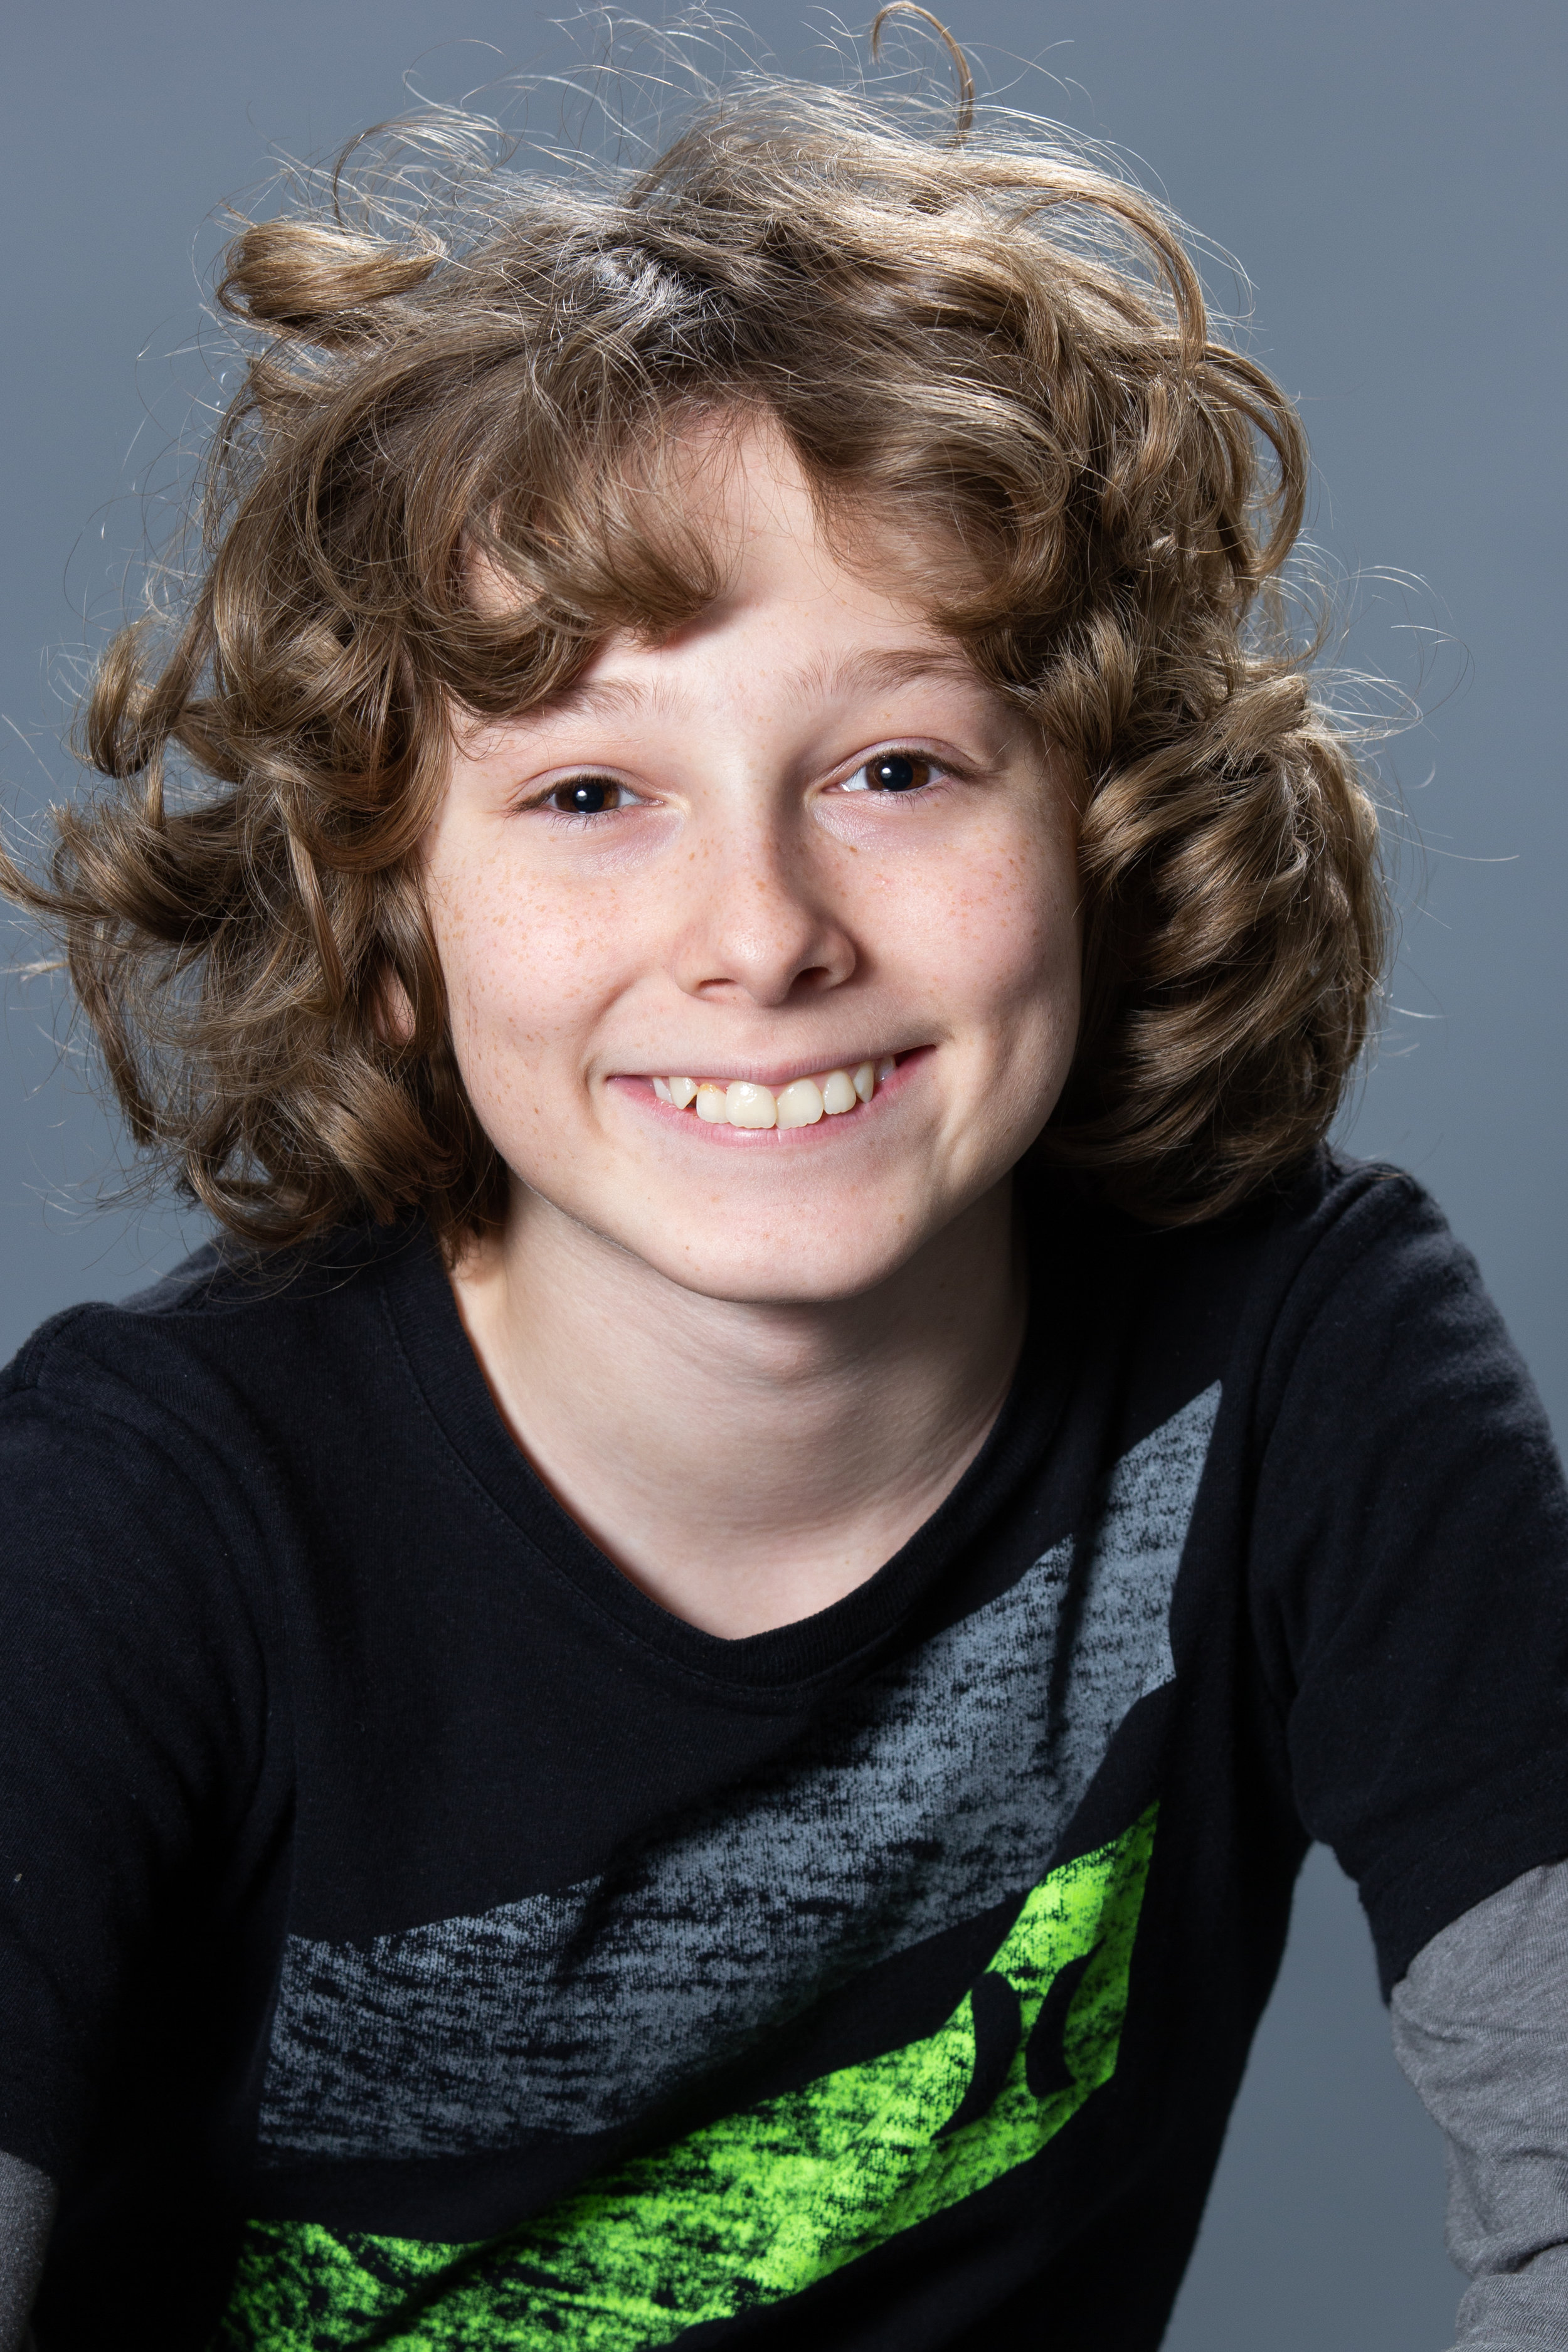 Patrick Geringer